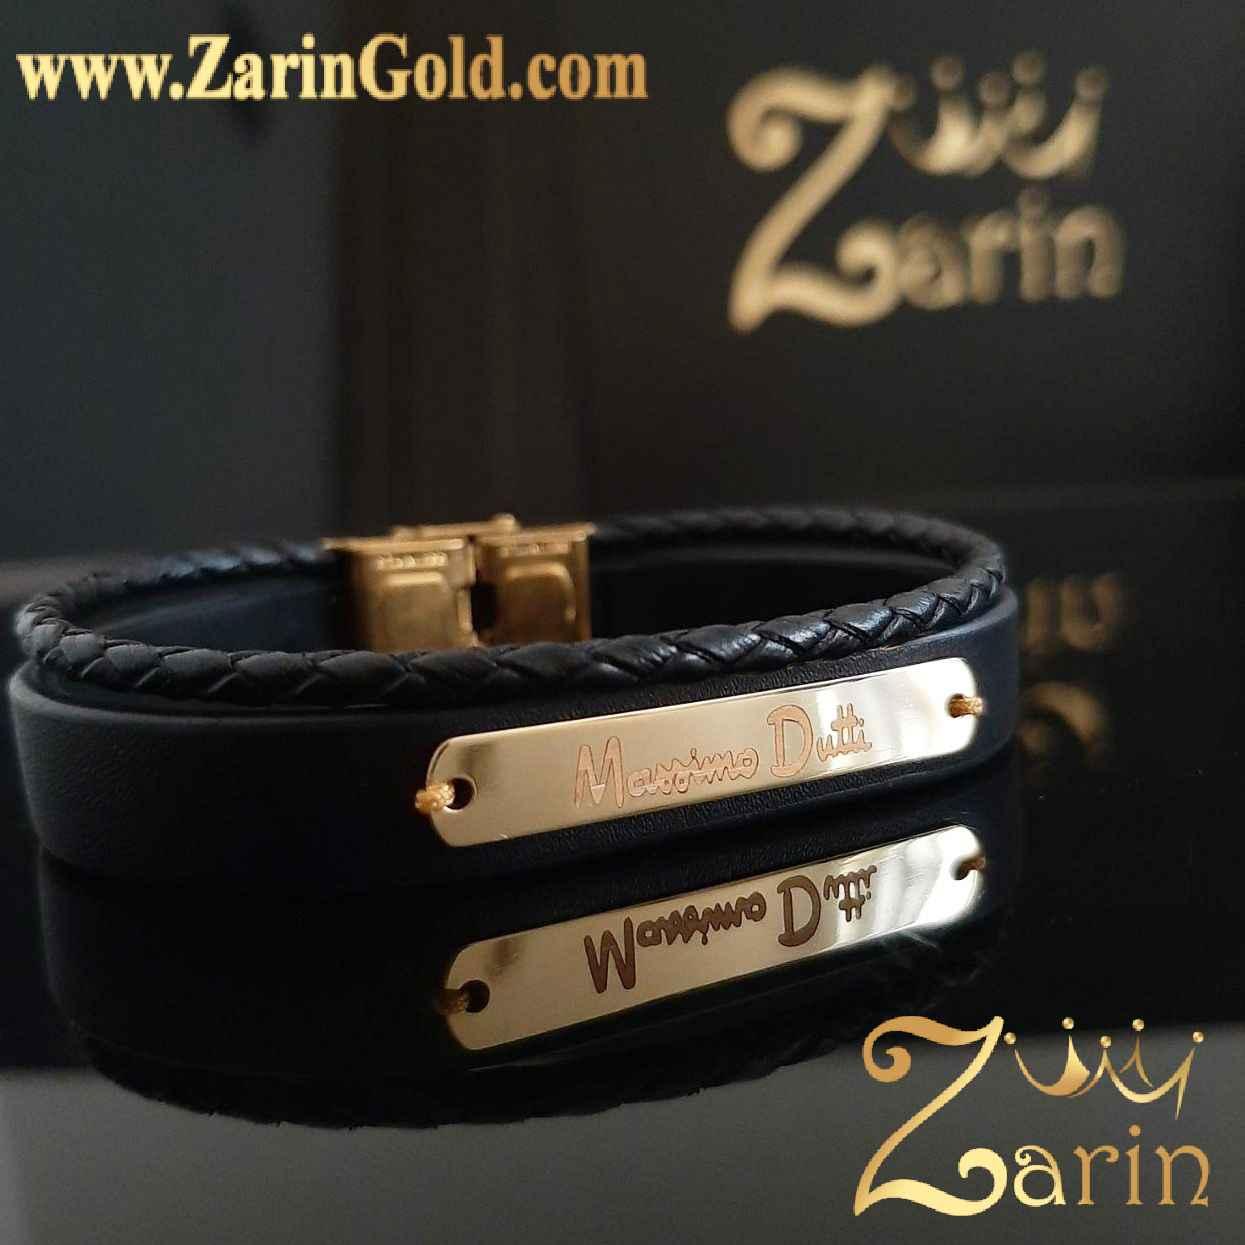 دستبند طلا با حک ماسیمو دوتی